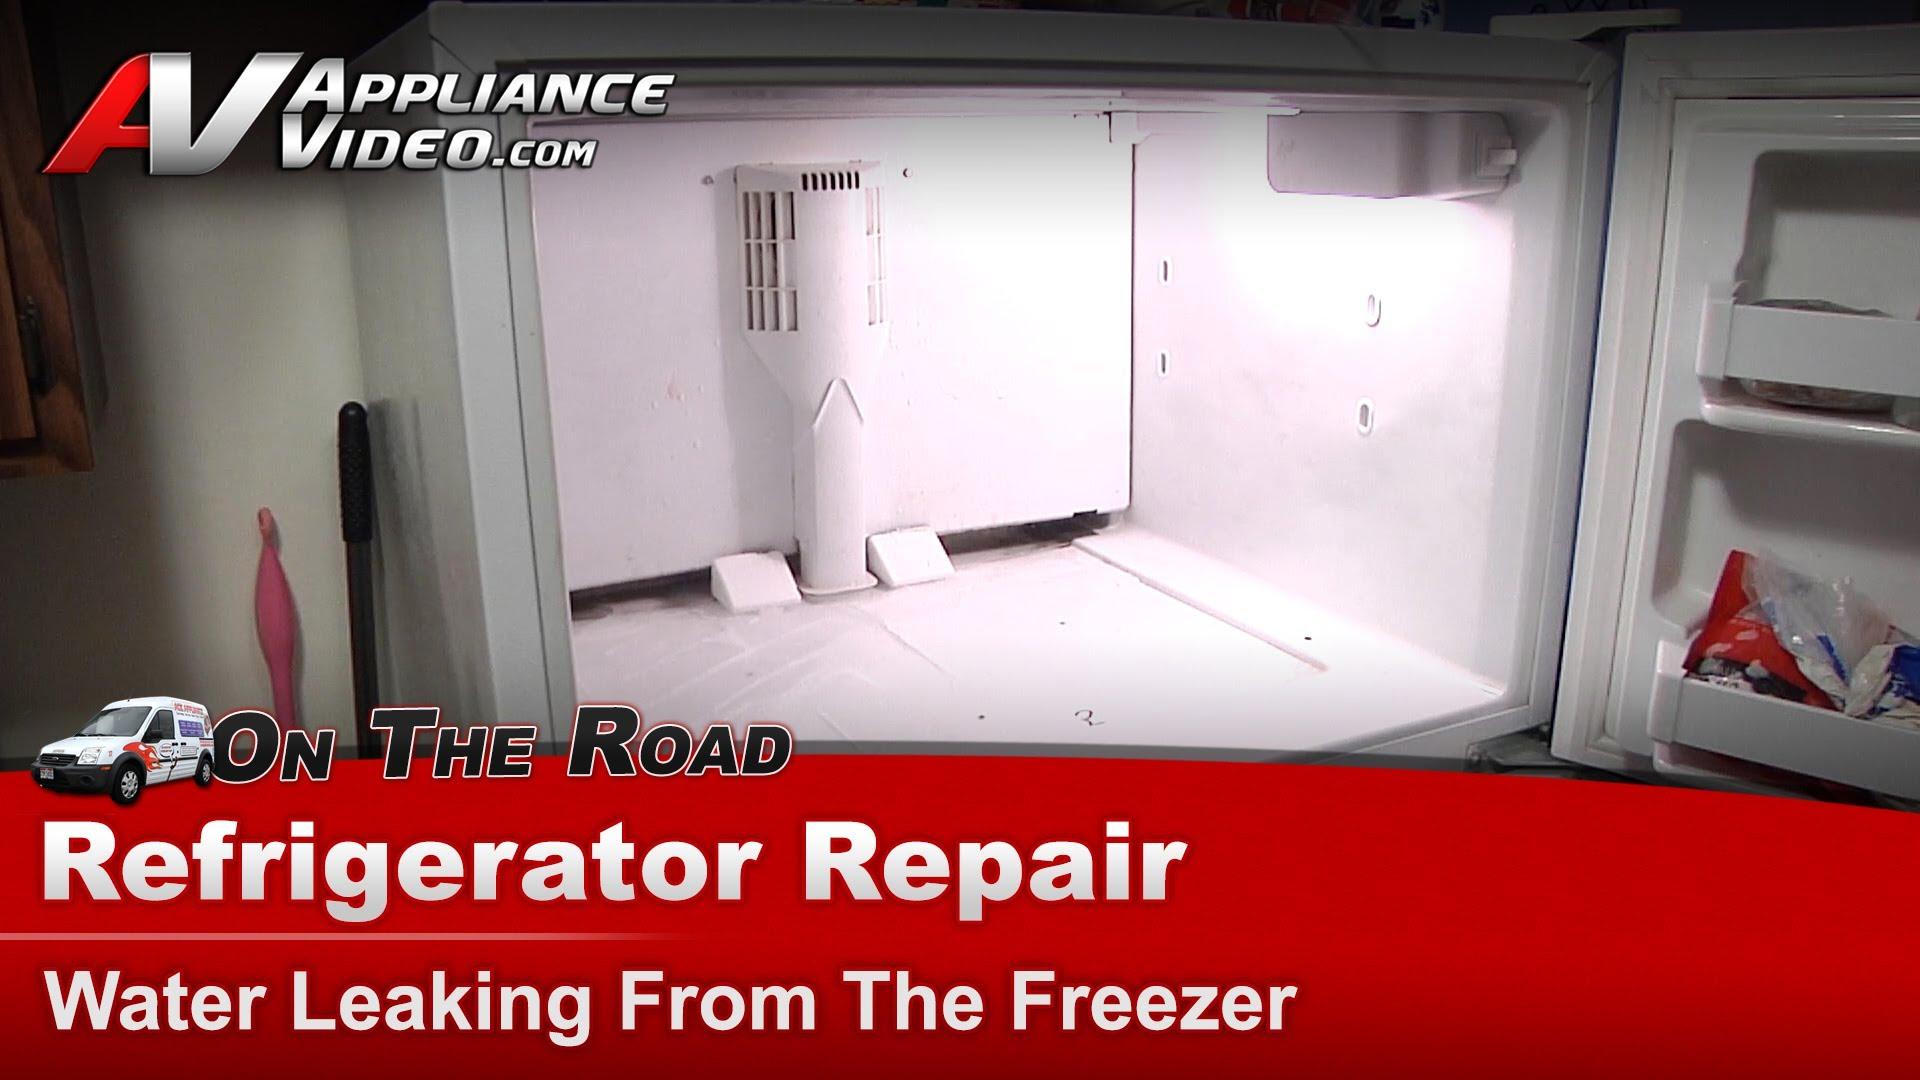 Kenmore 10677292790 Refrigerator Repair  Water leaking